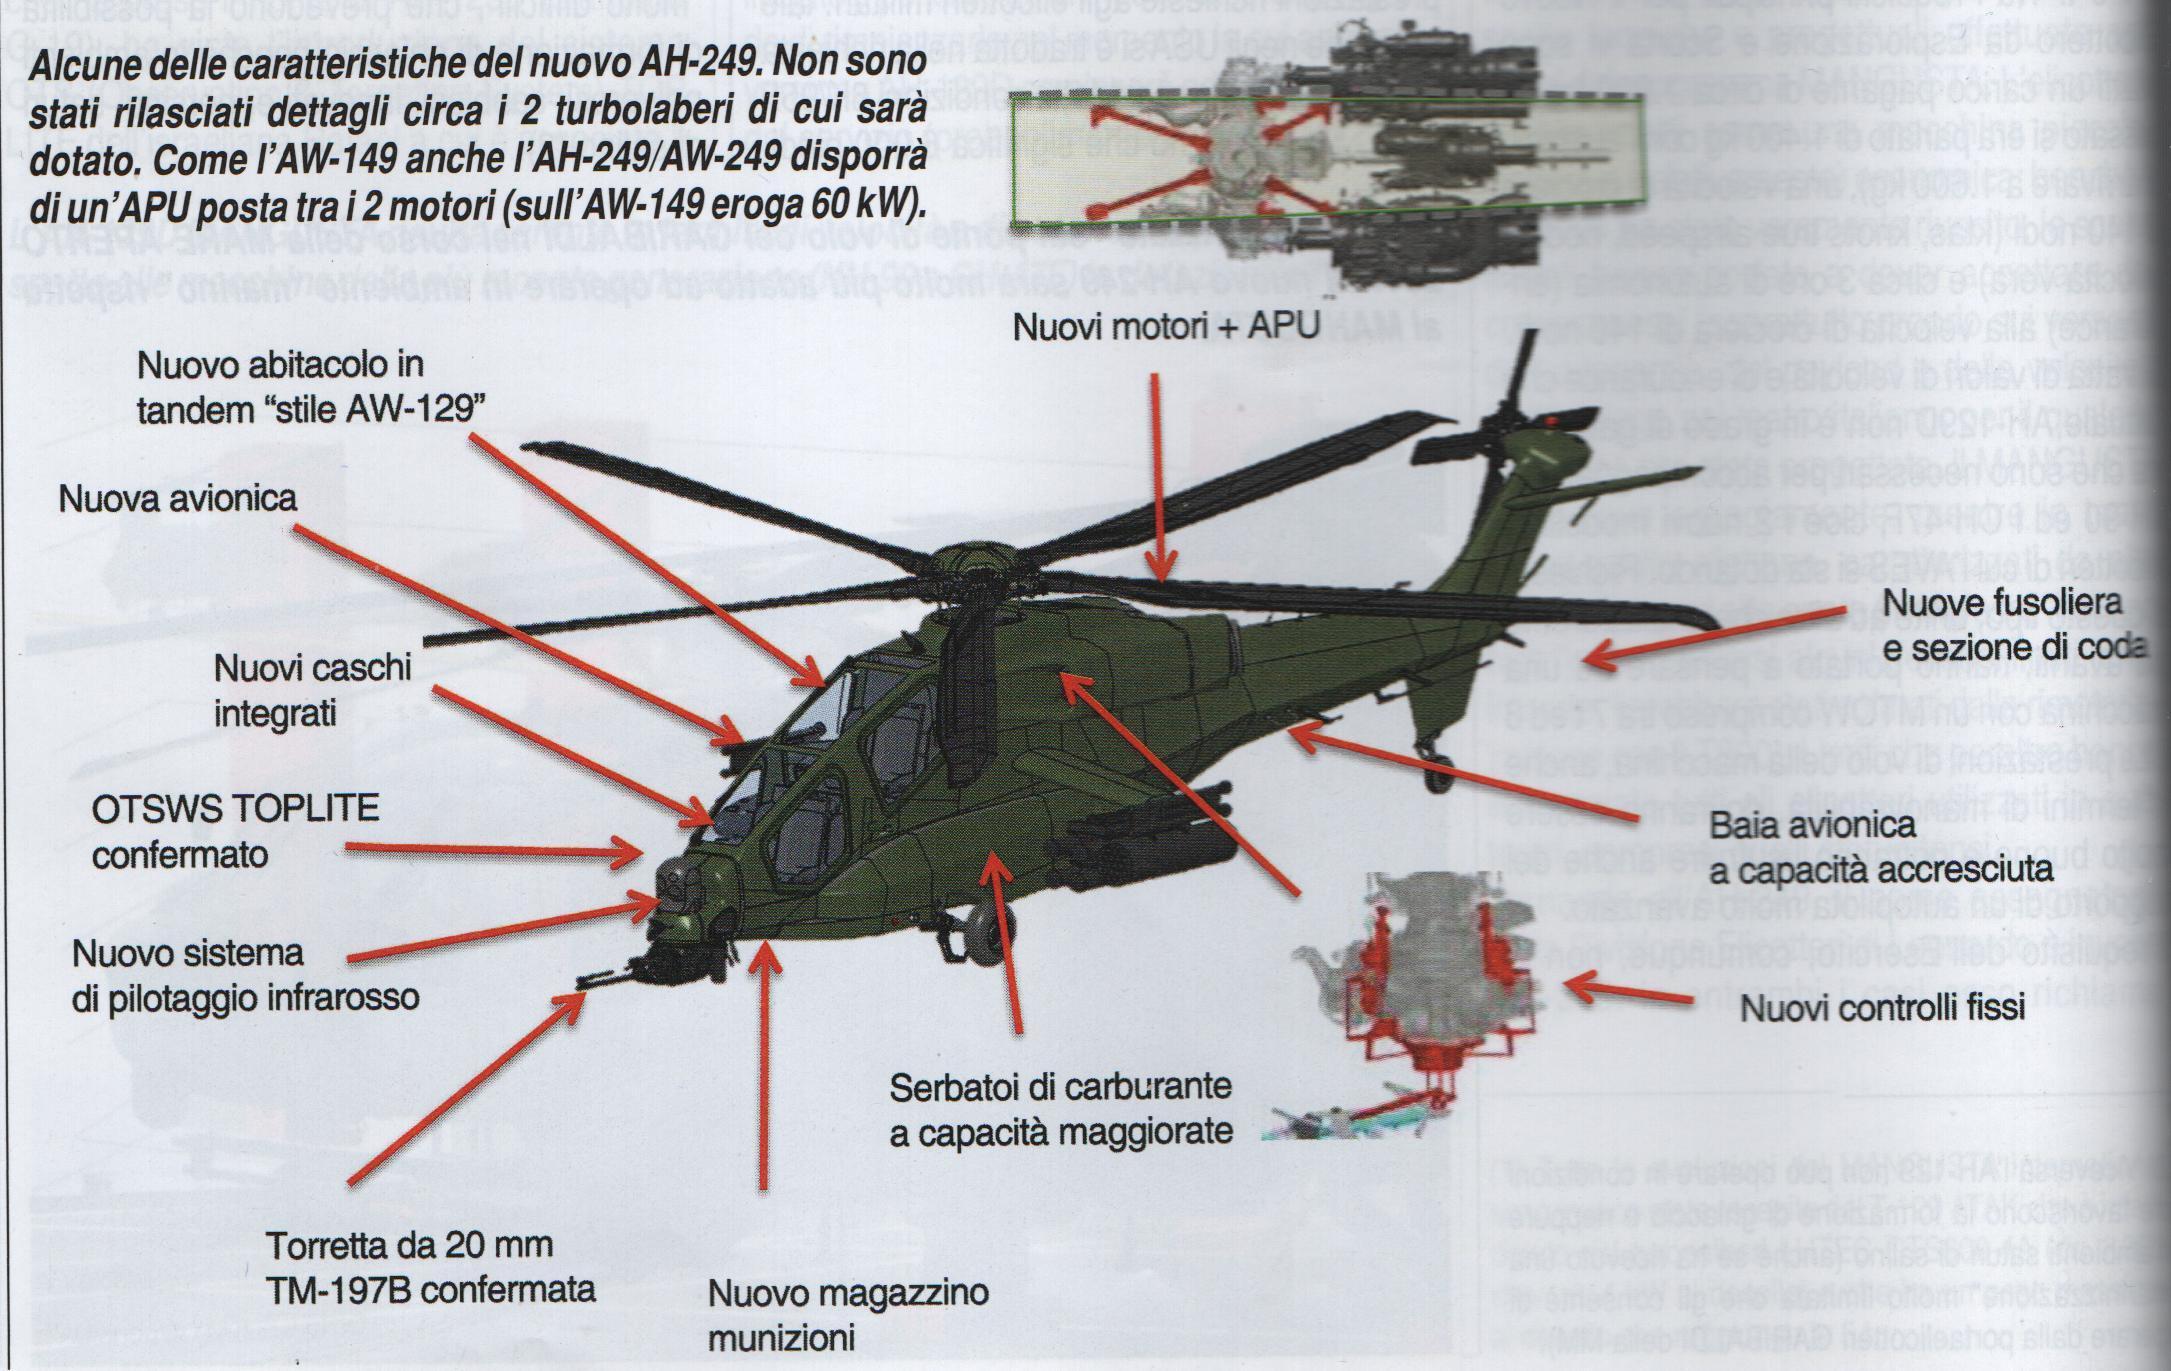 ah-249 mangusta successore attack helicopter italian army esercito italiano aves